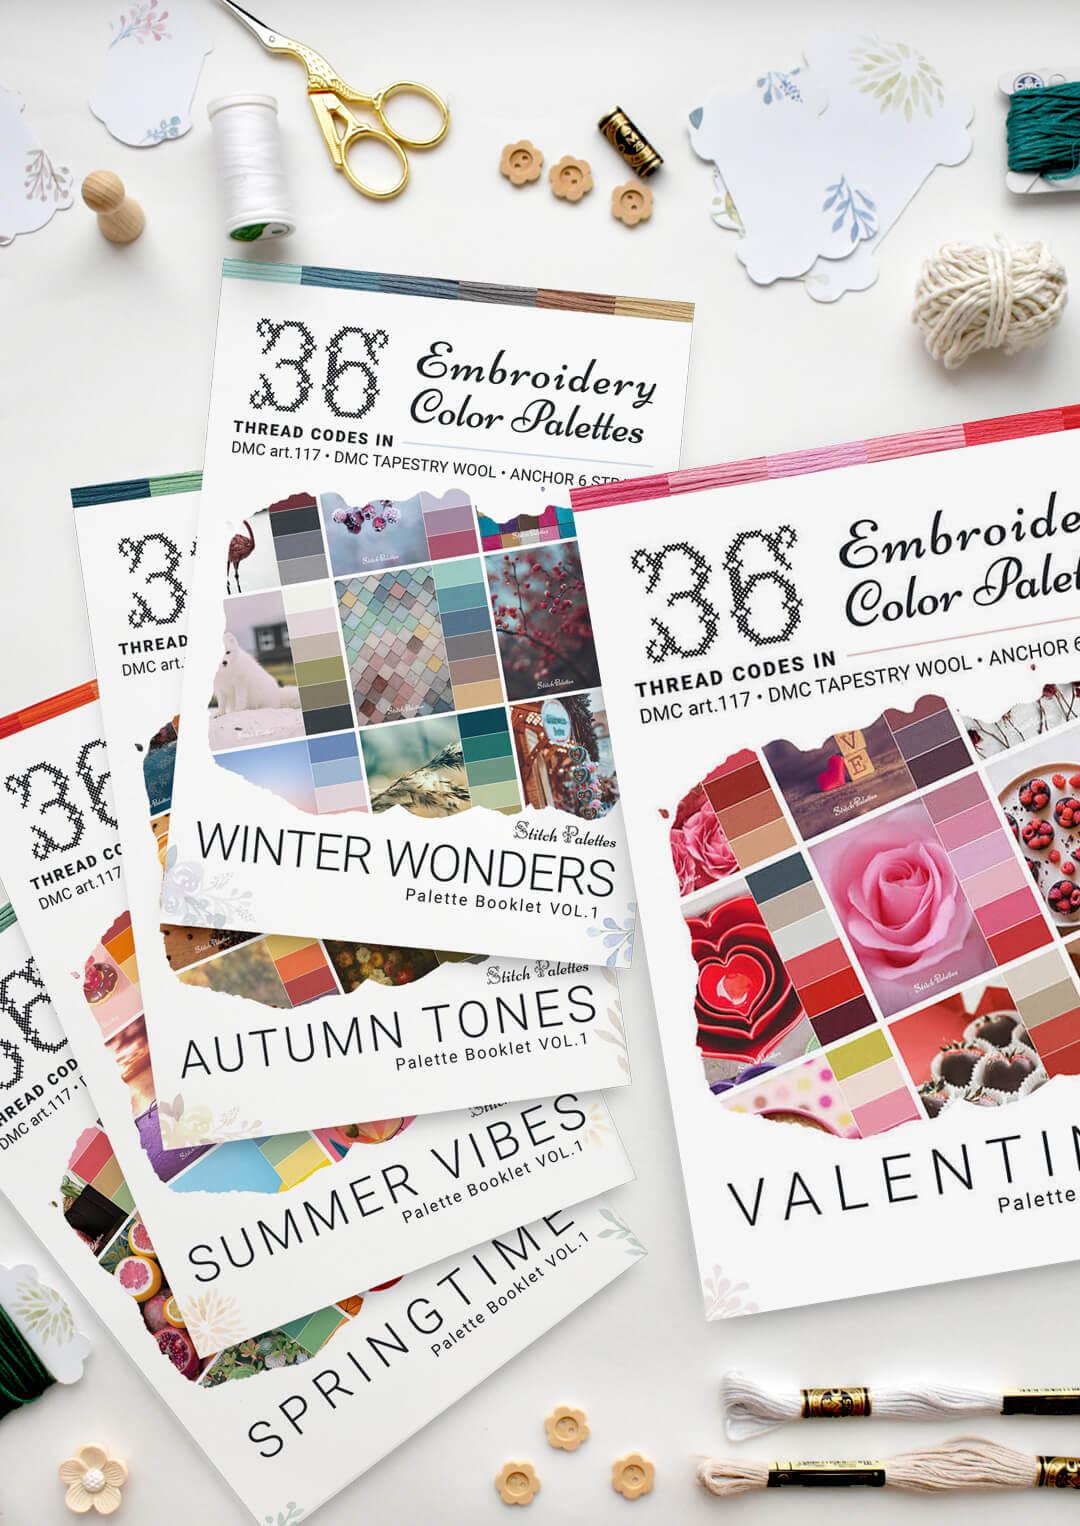 Seasonal palette bundle with Valentines Booklet